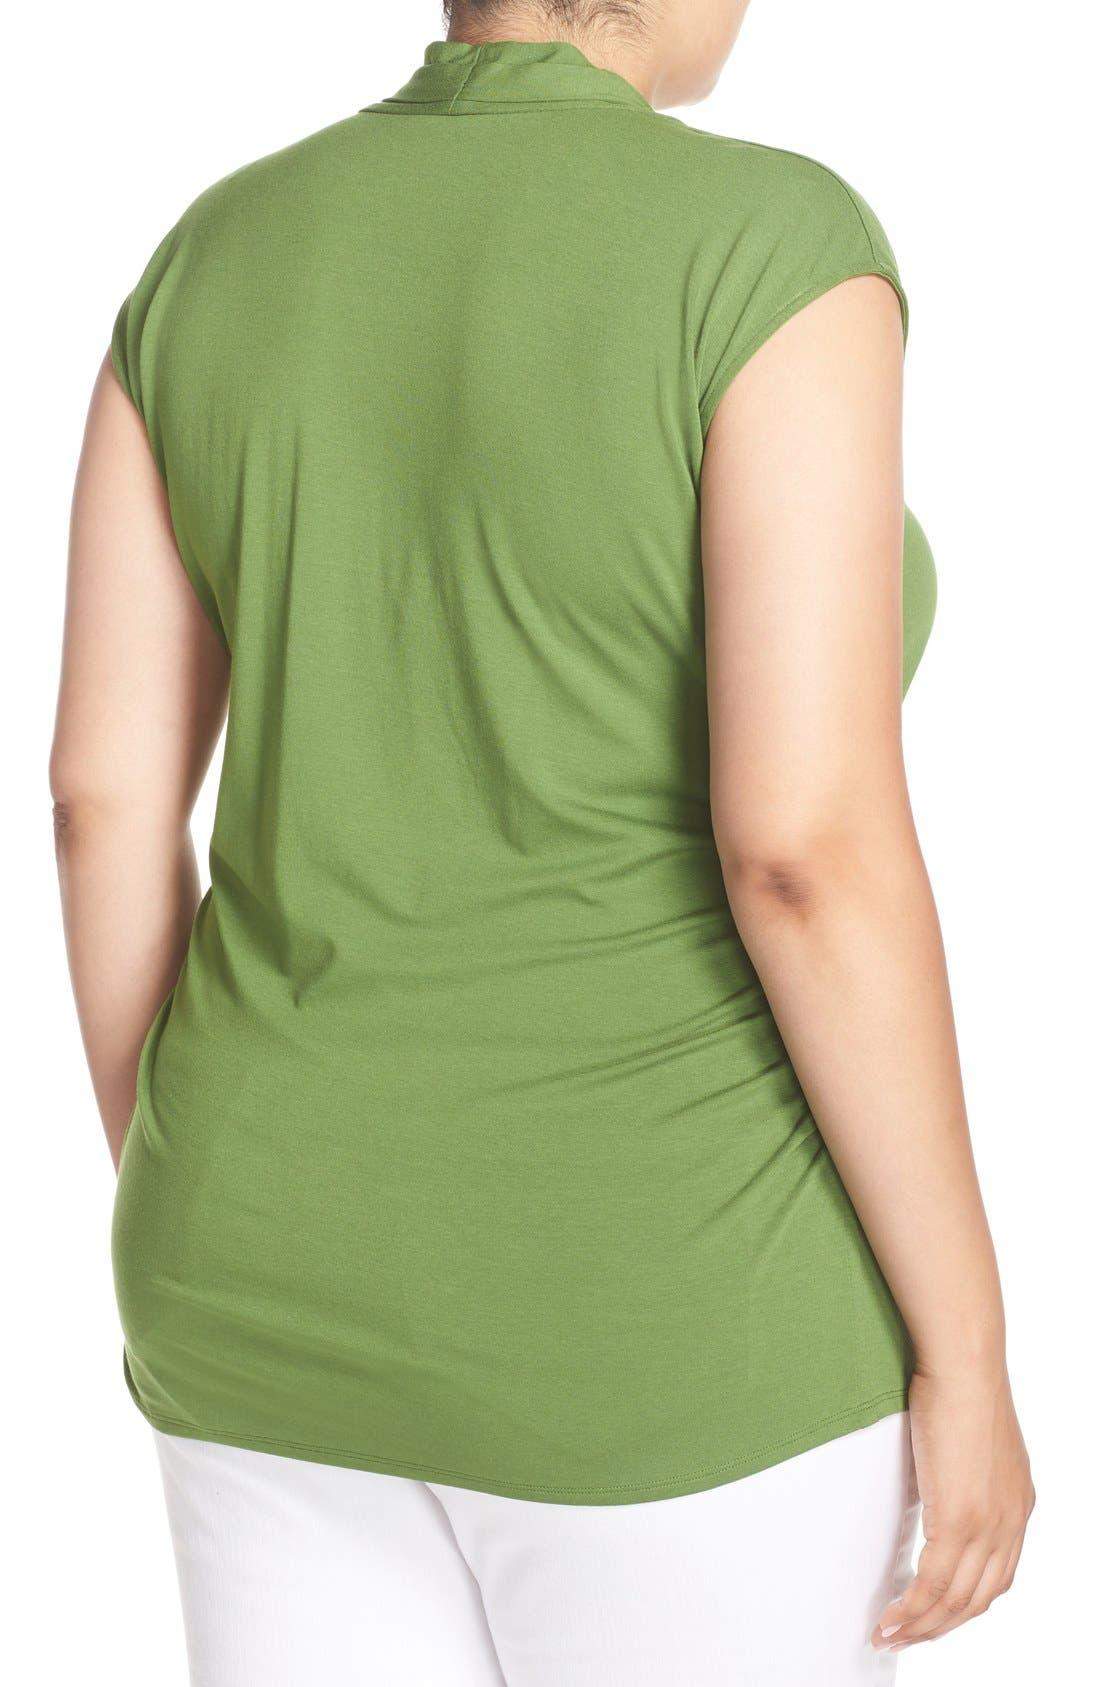 Alternate Image 2  - Vince Camuto Pleat V-Neck Knit Top (Plus Size)